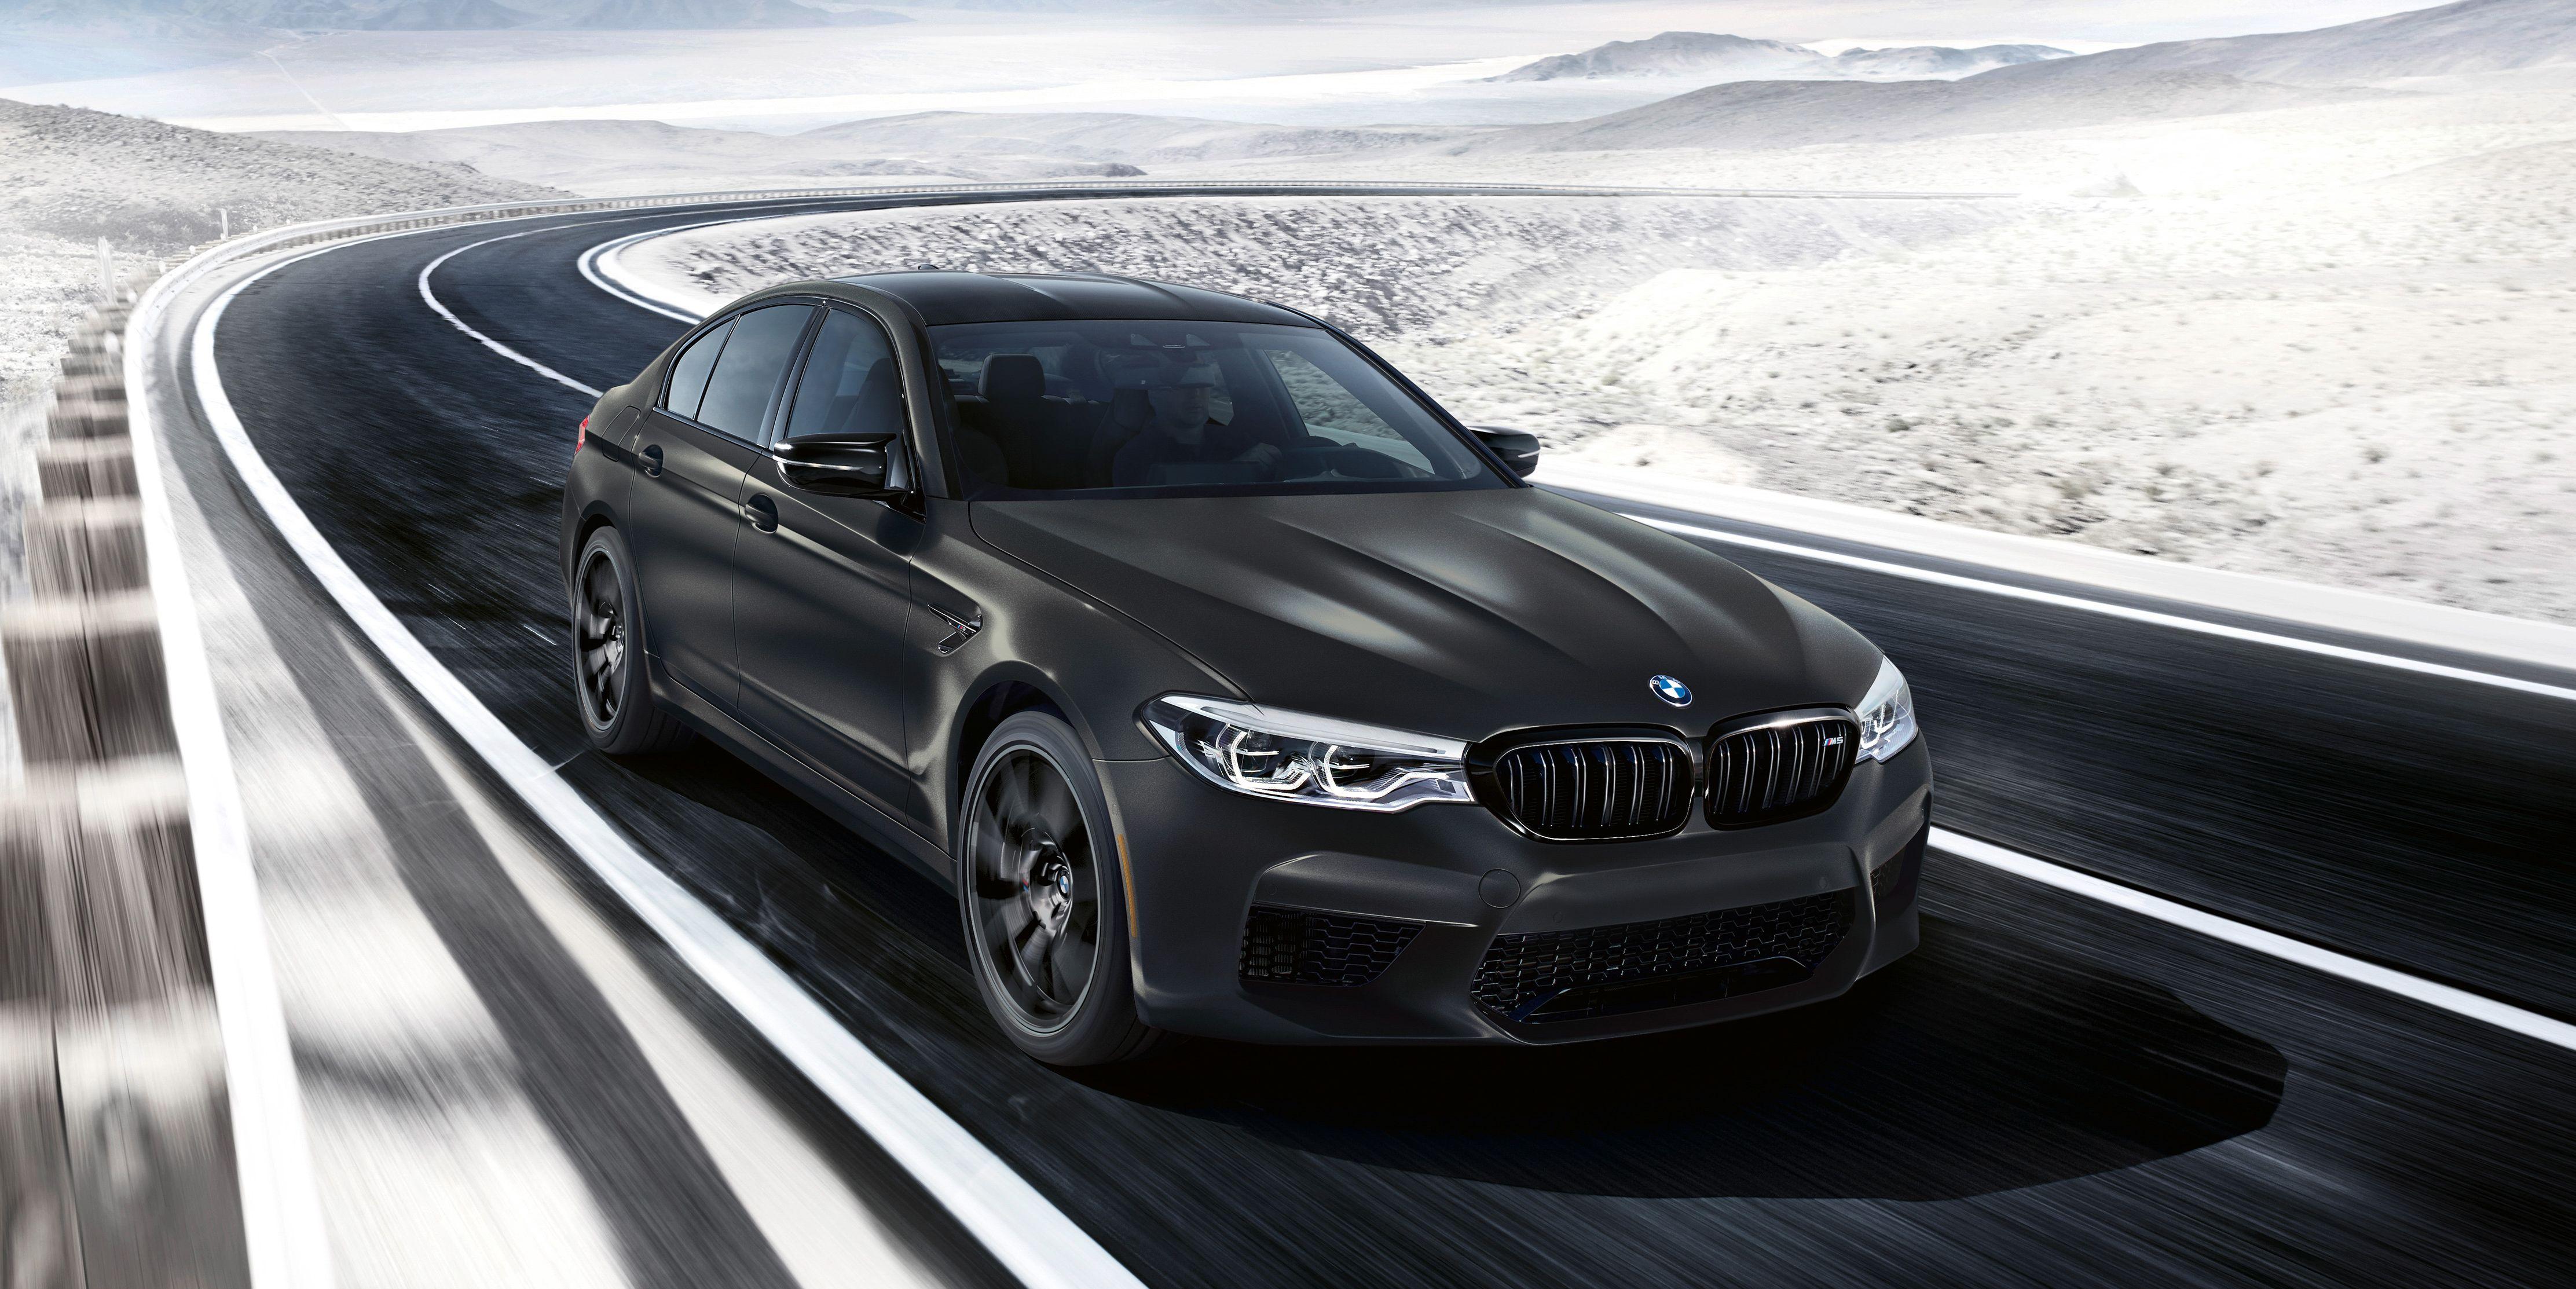 The 2020 BMW M5 Edition 35 Years Has Insane Gold Interior Trim